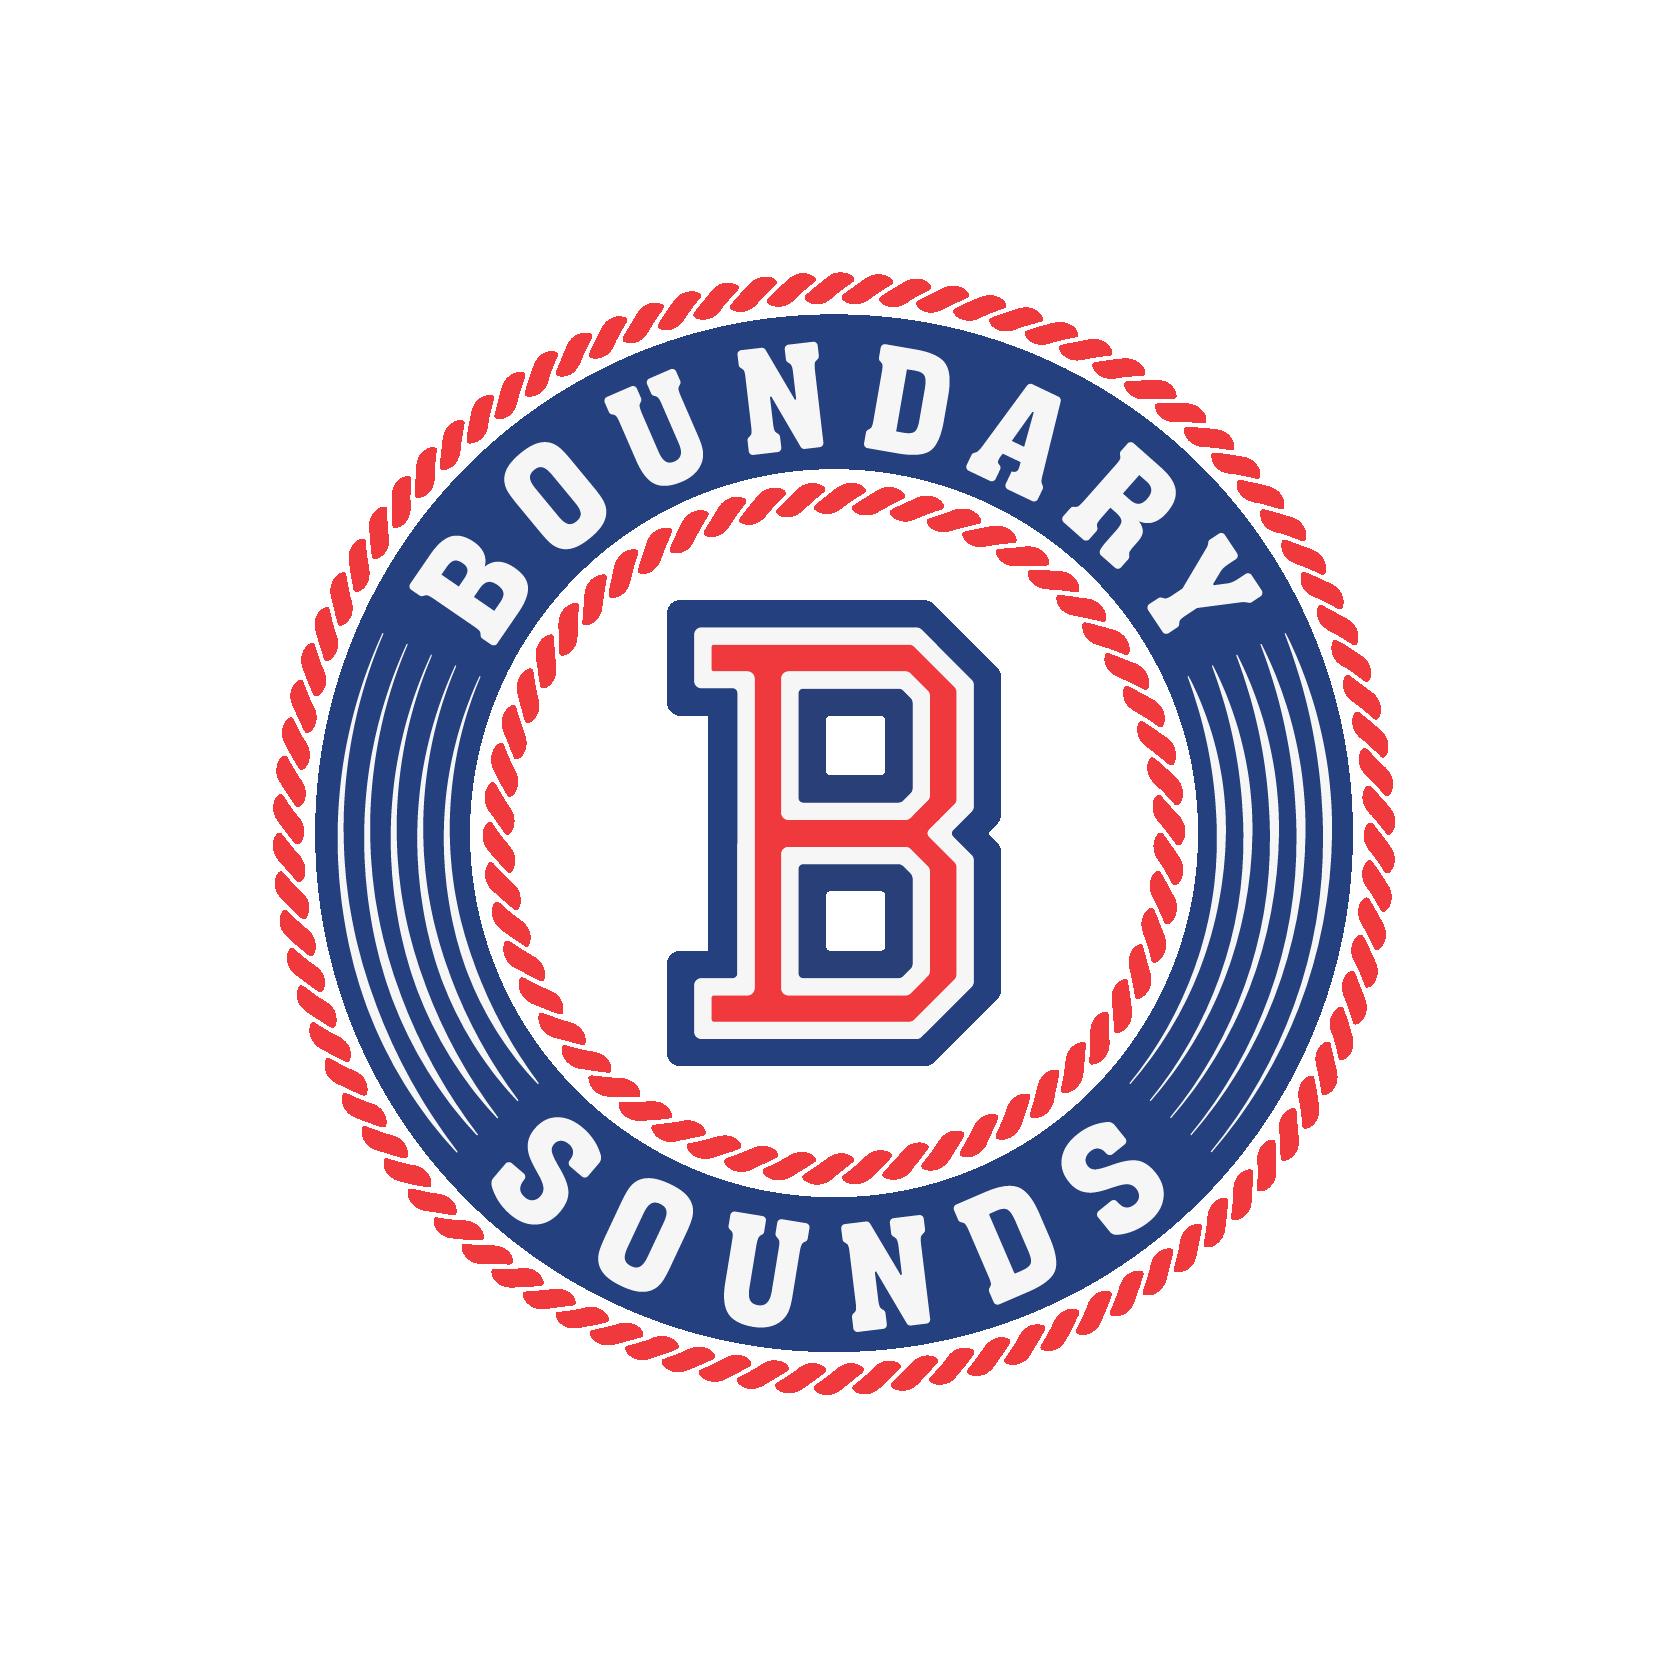 BoundarySounds_logo_STAMP-ROPE_colour.png